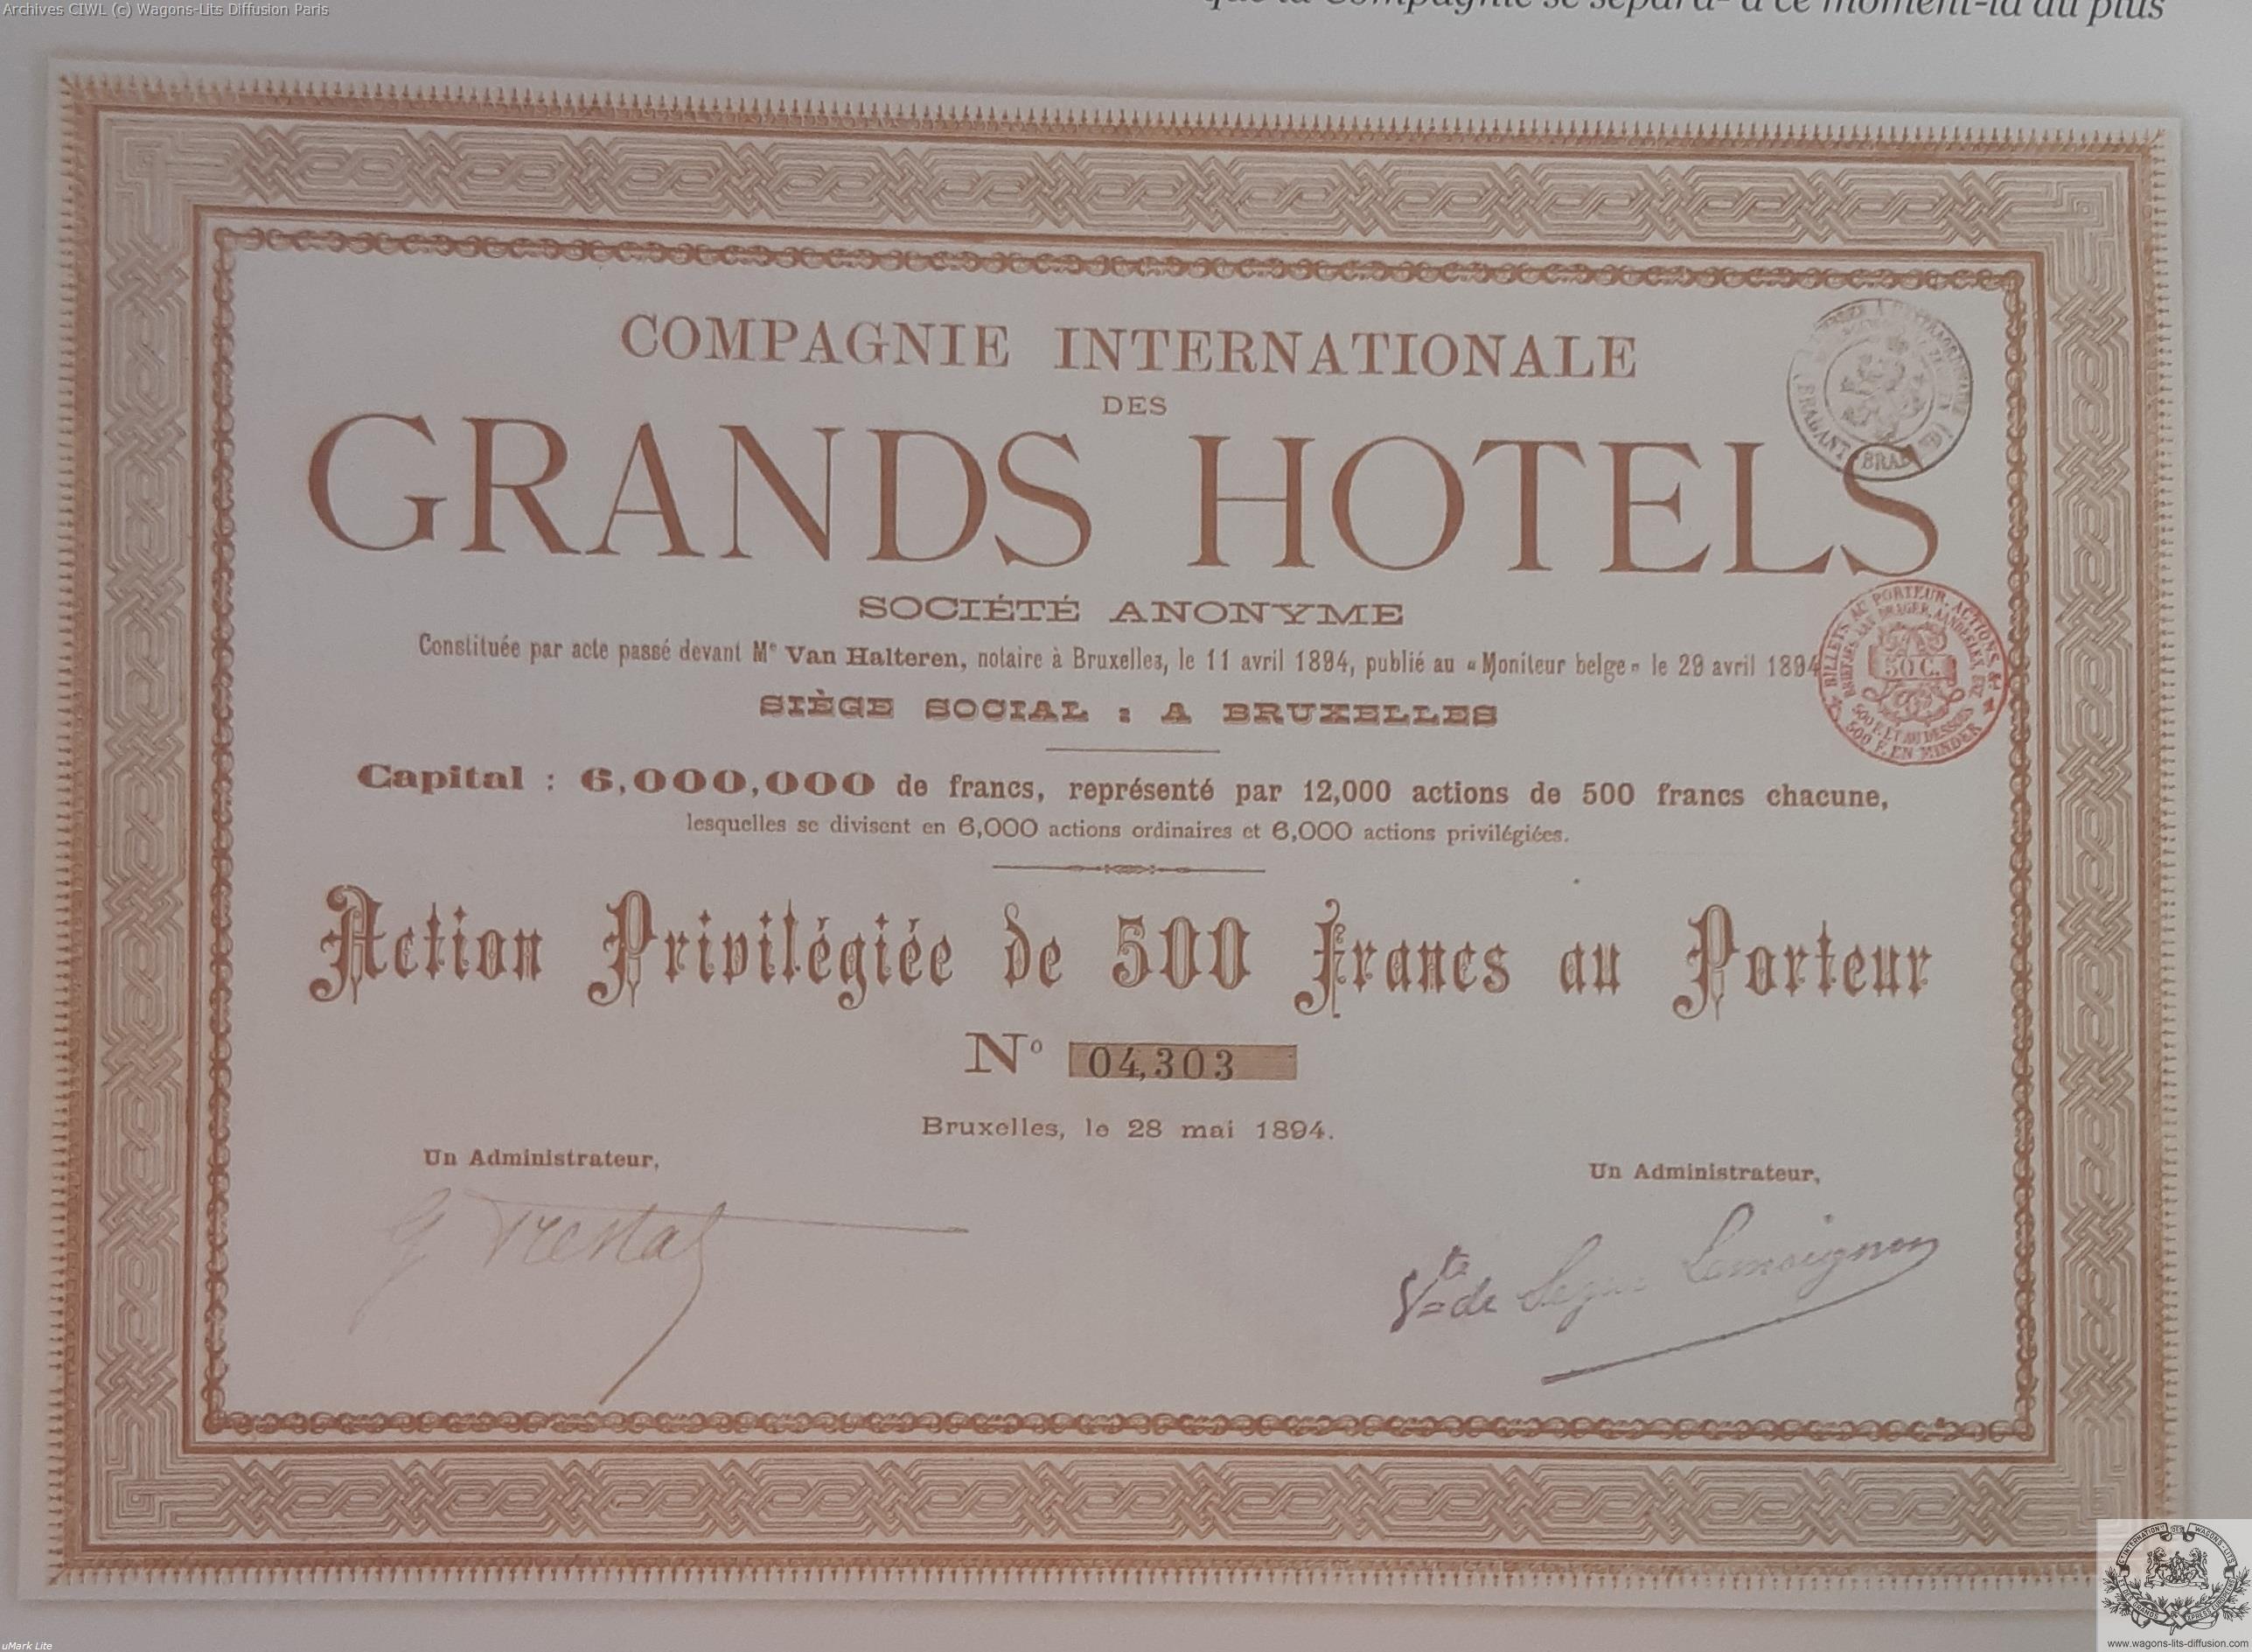 Wl action cie interna grands hotels 1894